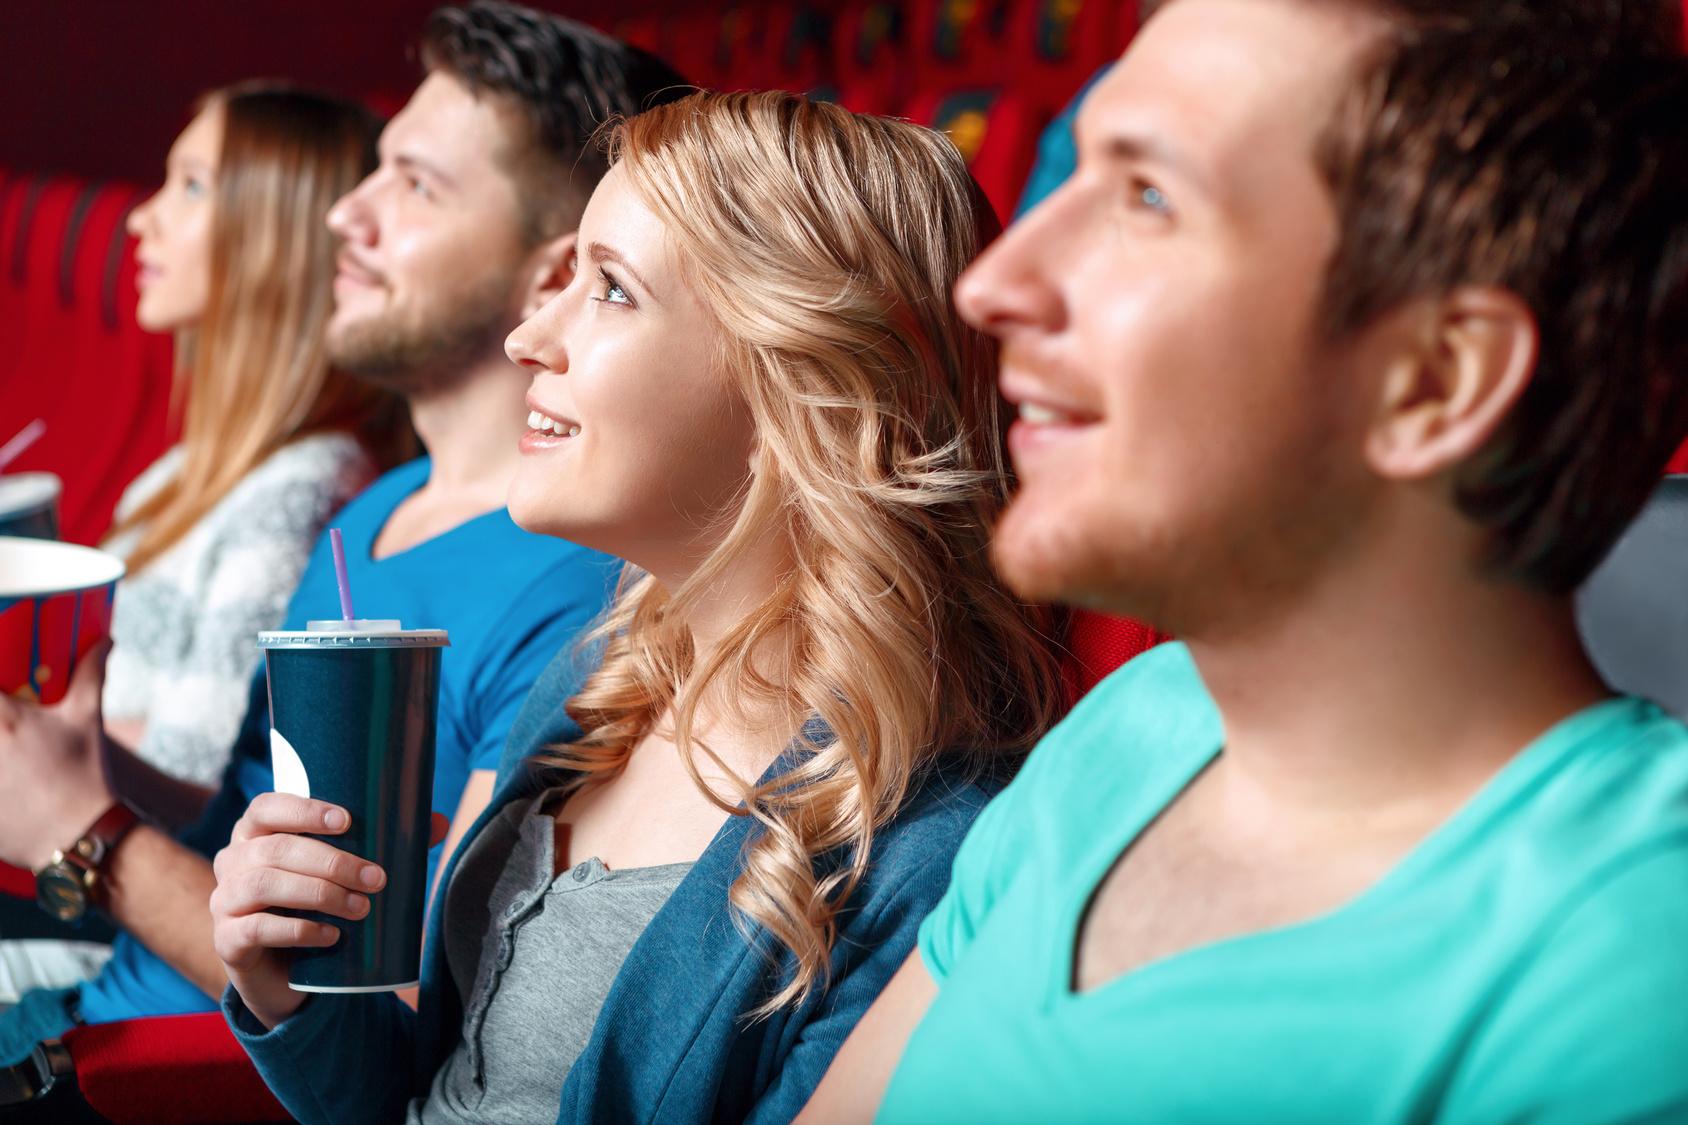 Cinema free ticket offer